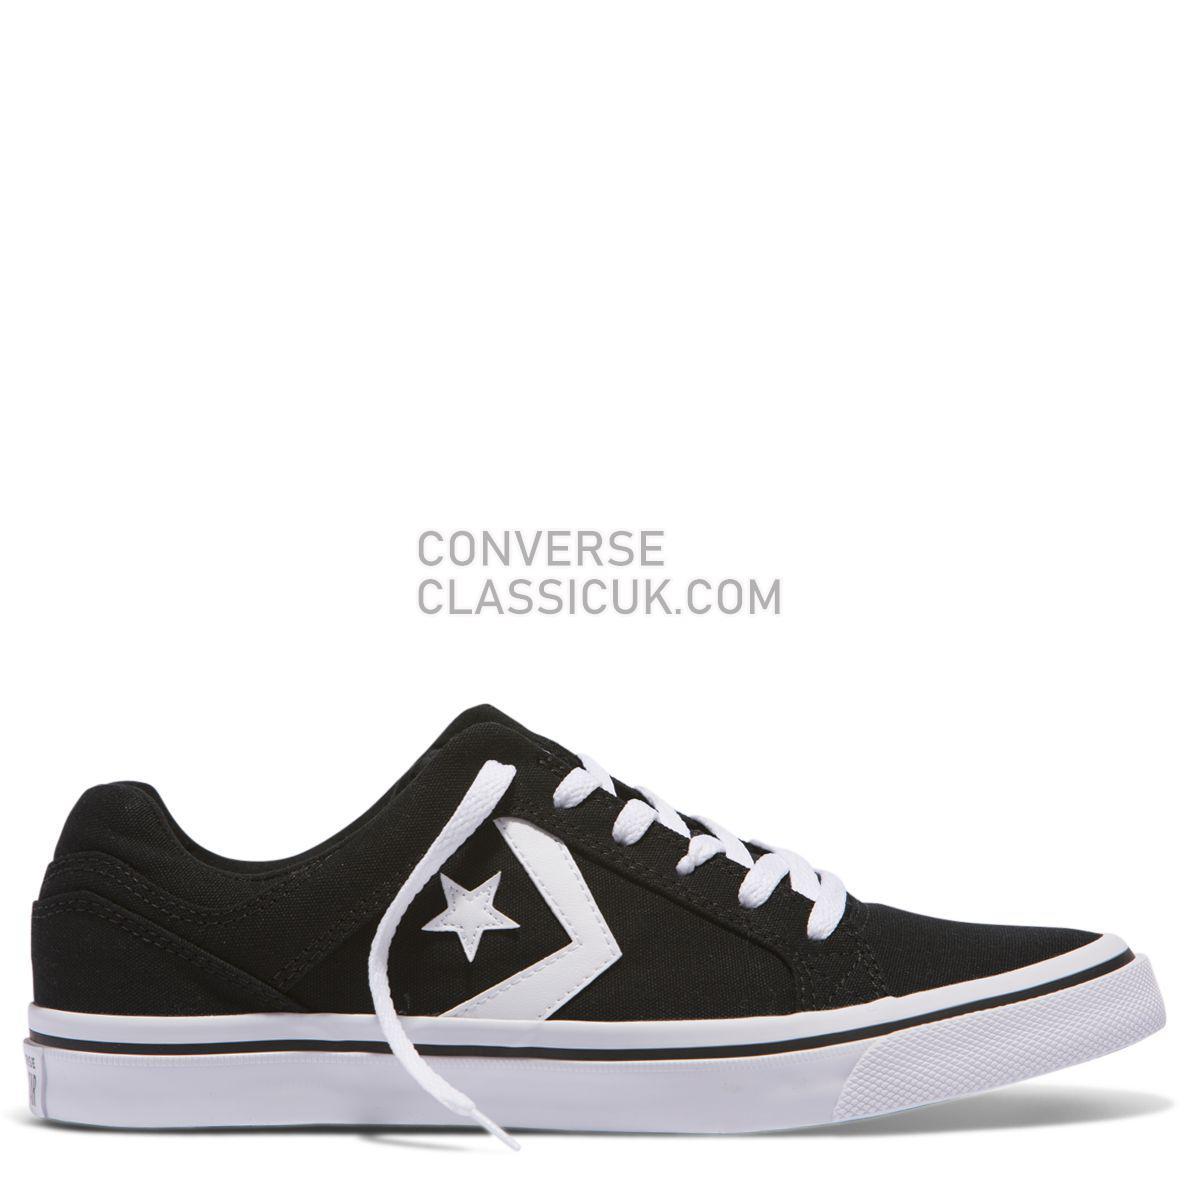 Converse Distrito Canvas Low Top Black Mens 155064 Black/White/Black Shoes